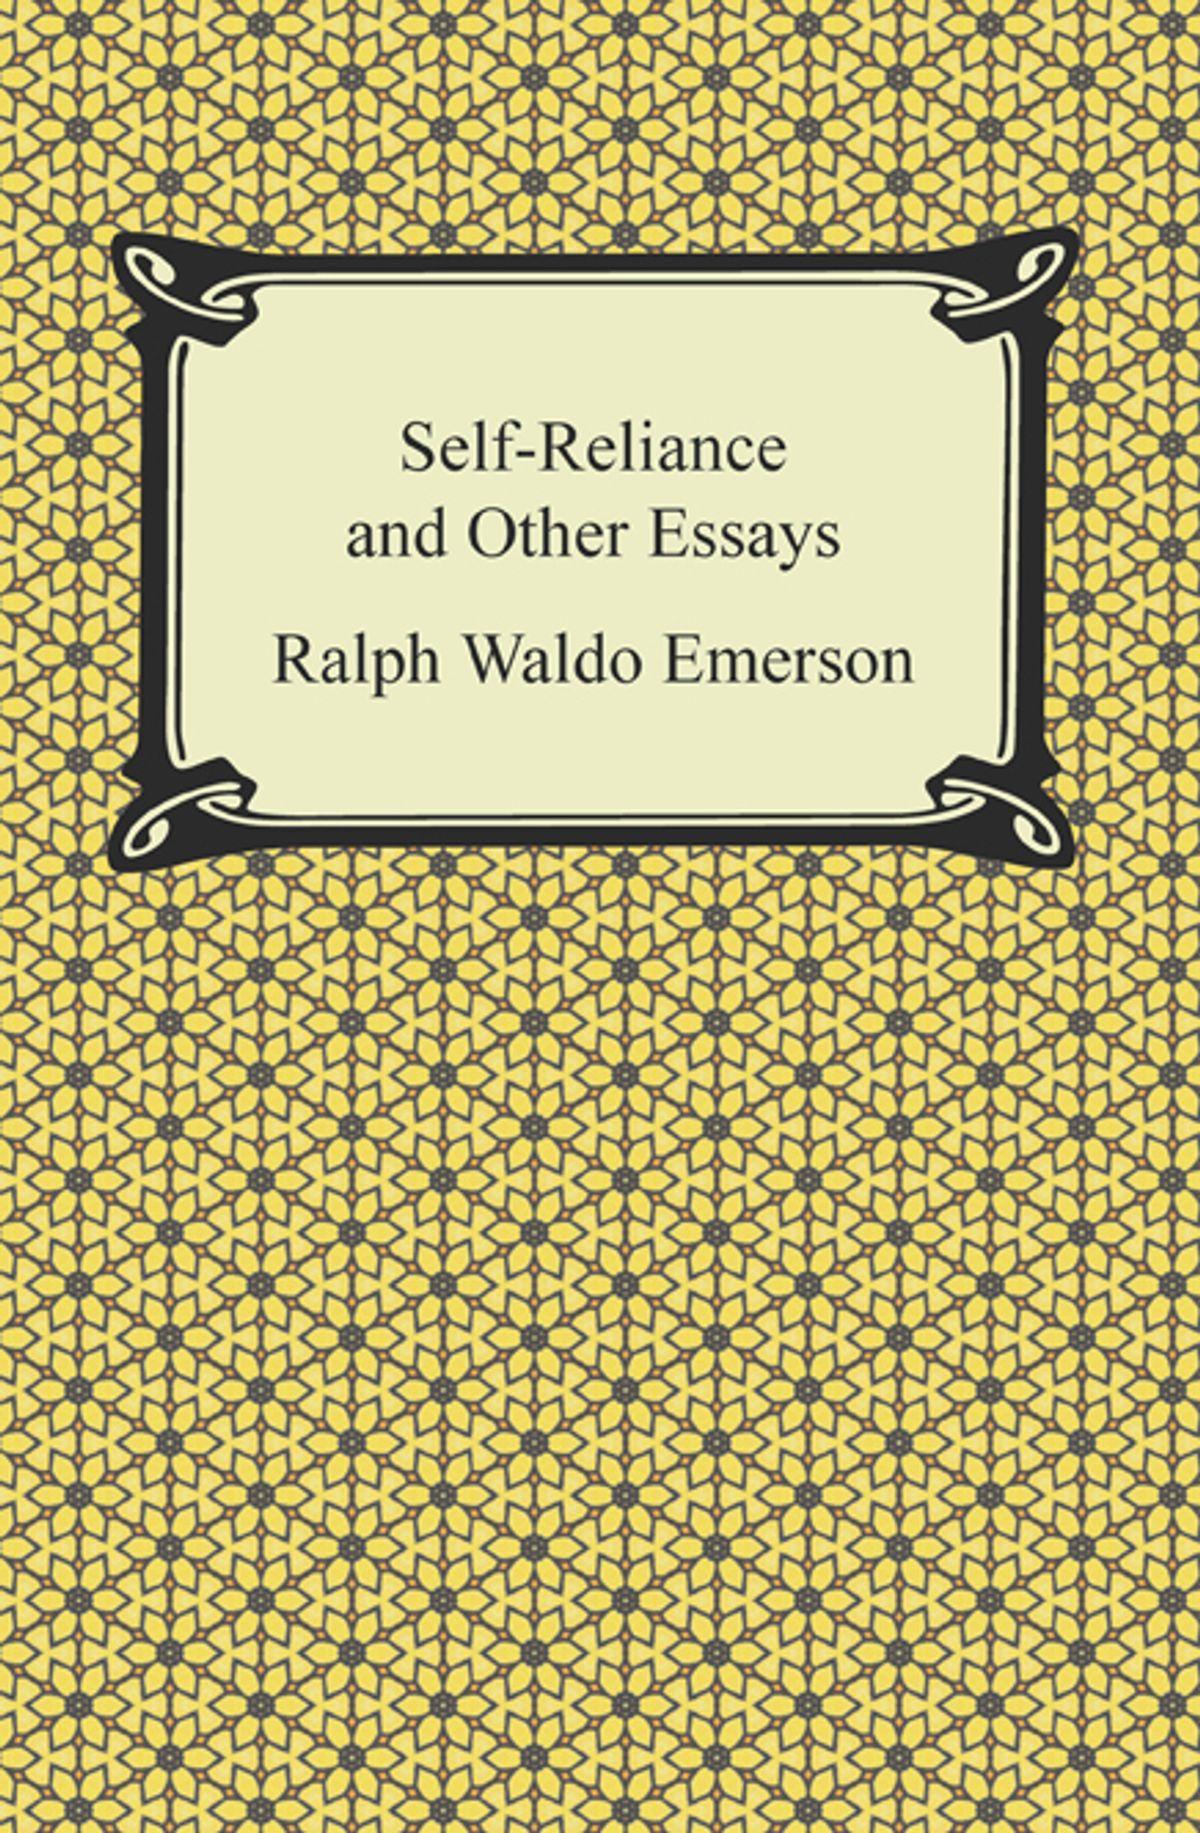 017 Self Reliance And Other Essays Essay Example Formidable Ralph Waldo Emerson Pdf Ekşi Full